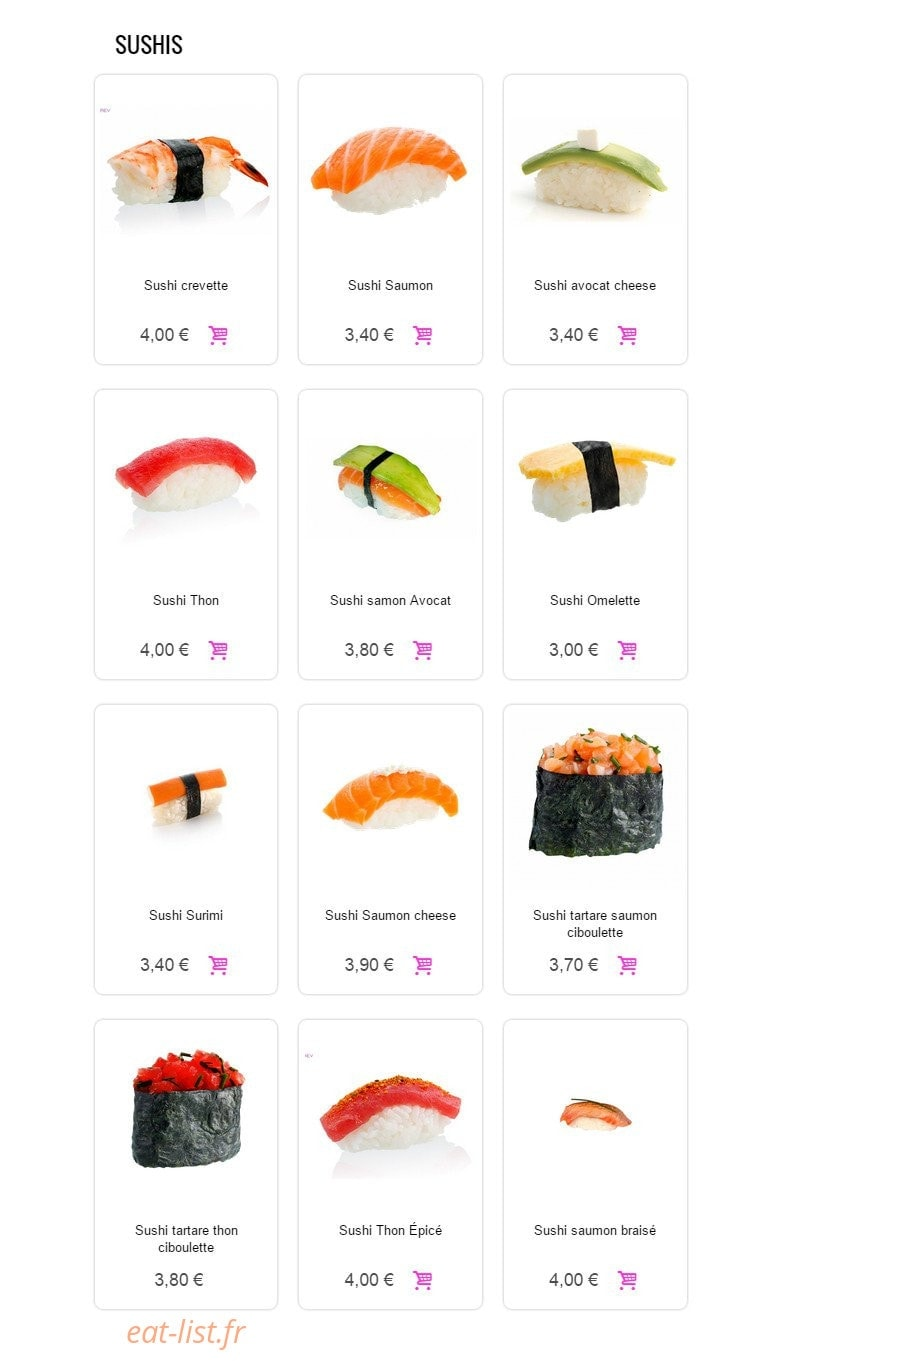 Sushi Sun A Conflans Sainte Honorine Carte Menu Et Photos